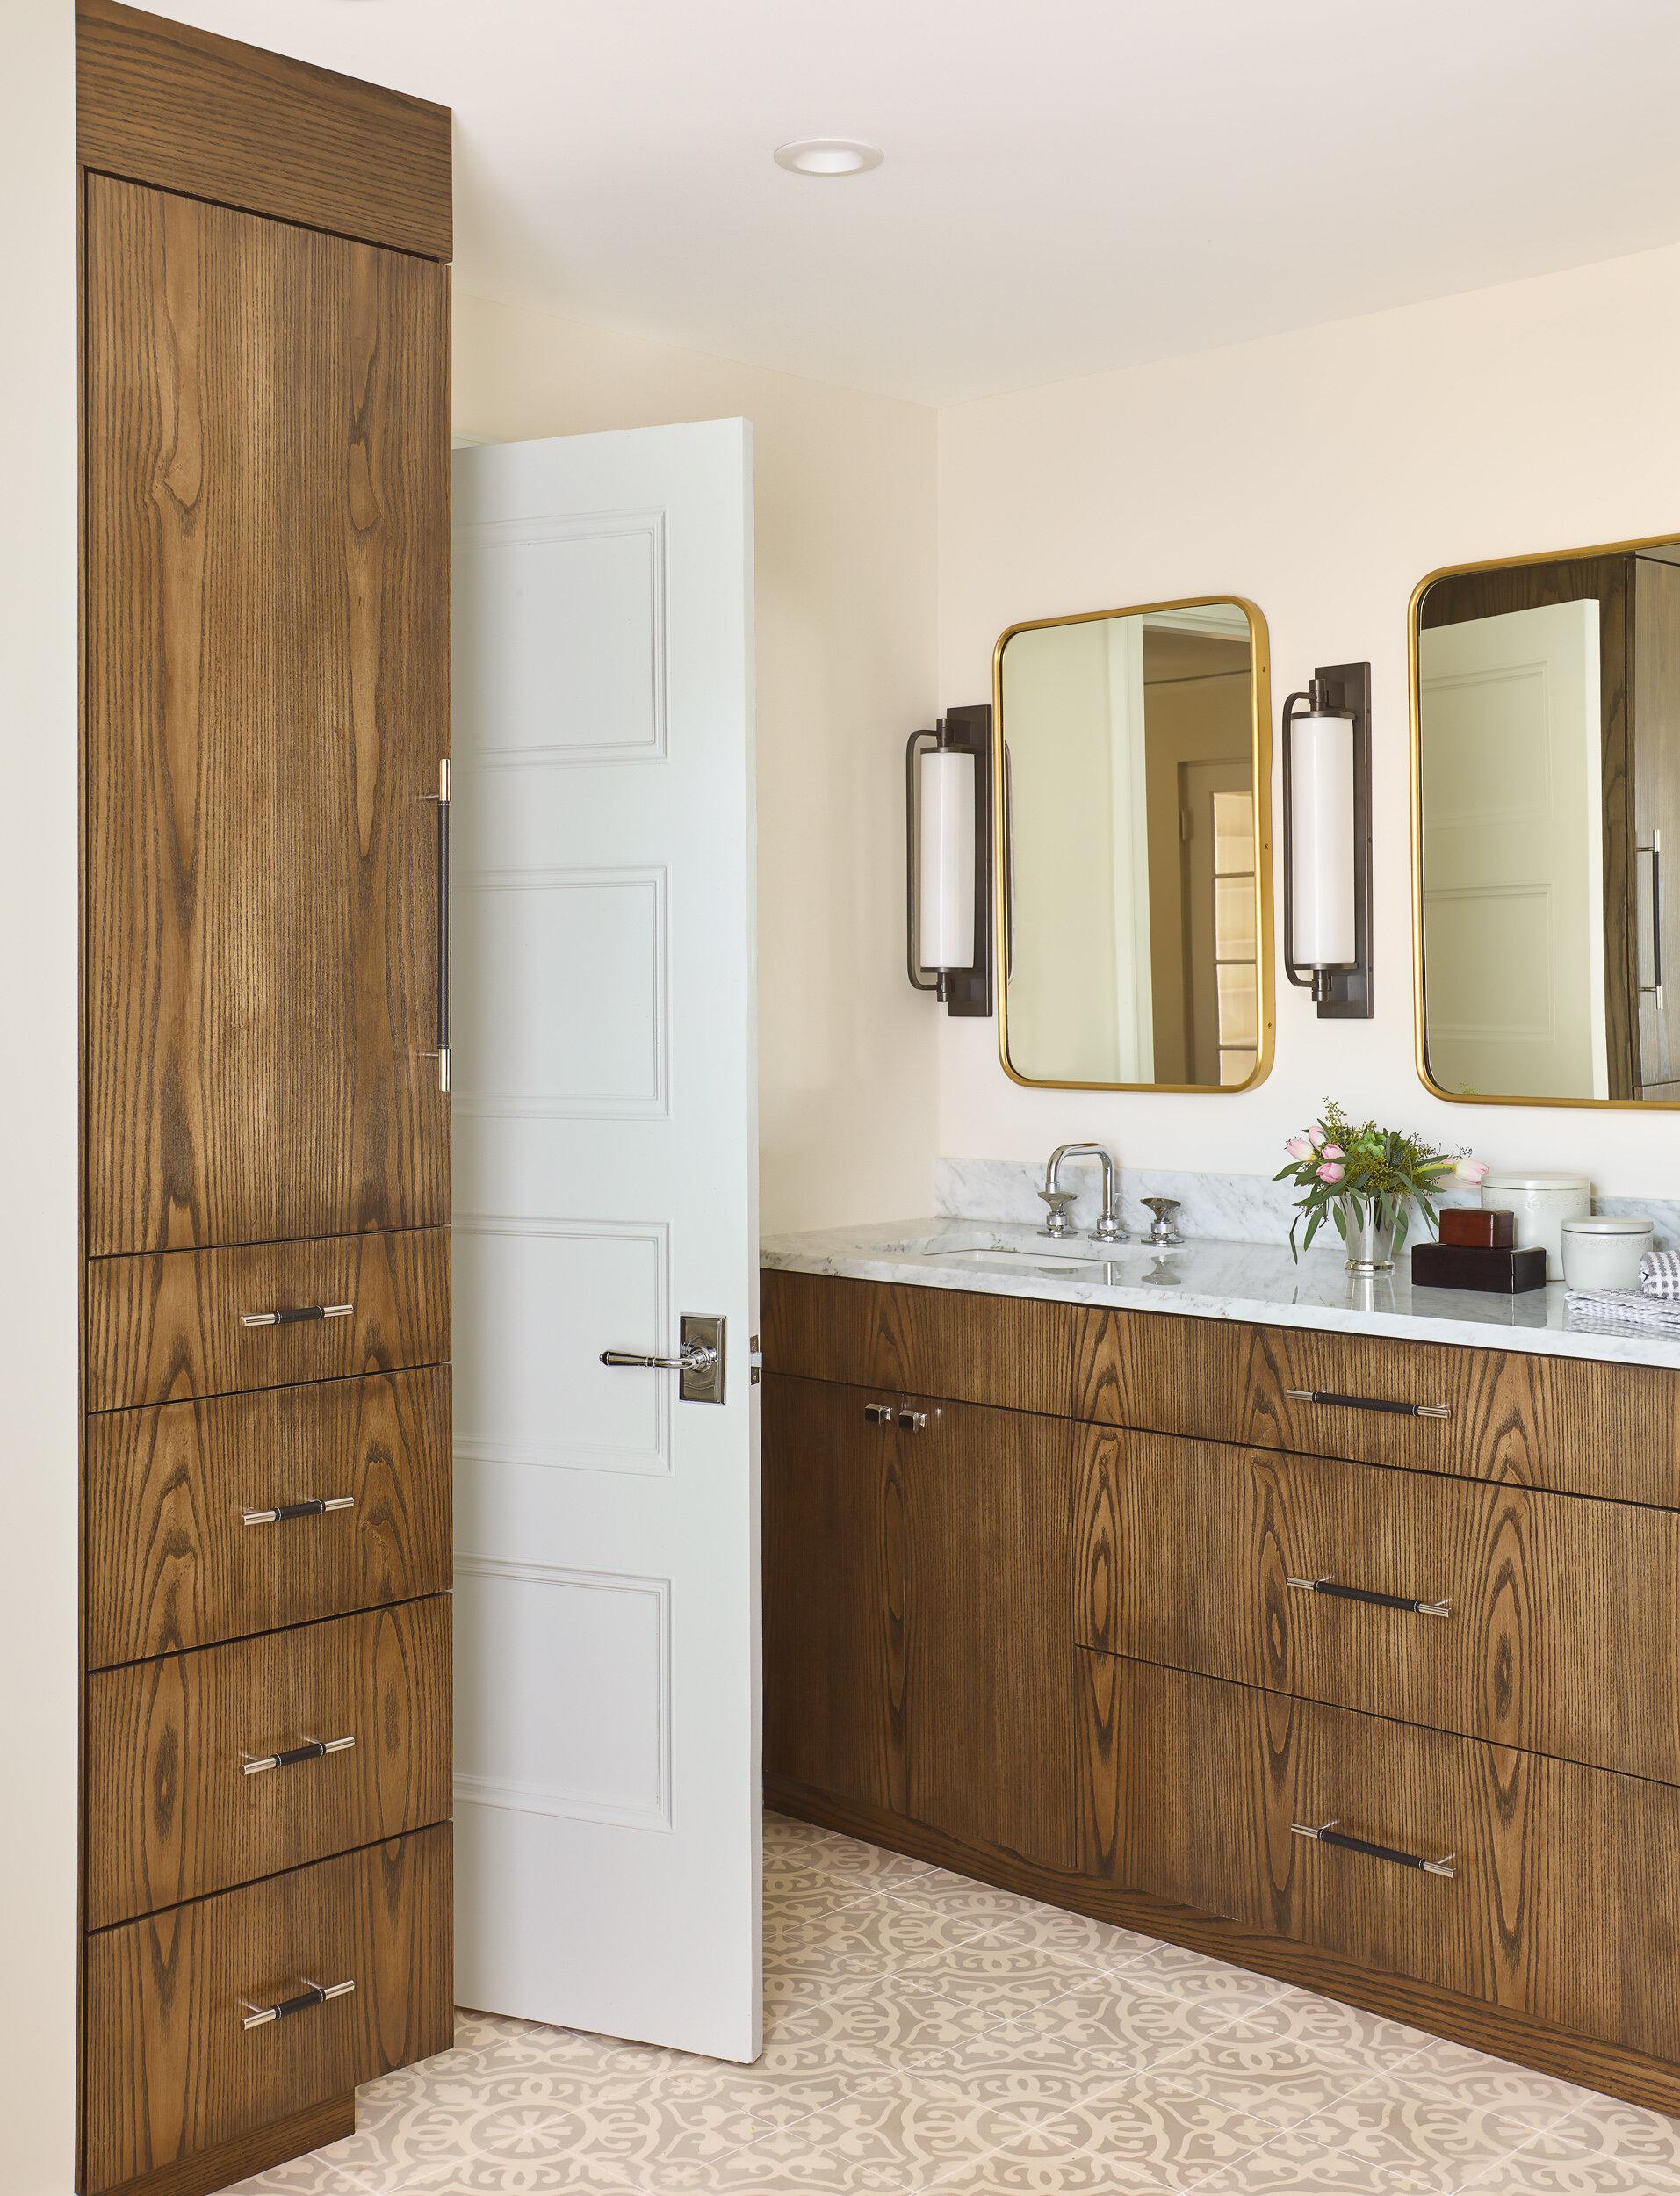 mackenzie-and-company-boston-westwood-interior-design-master-bathroom-style-5